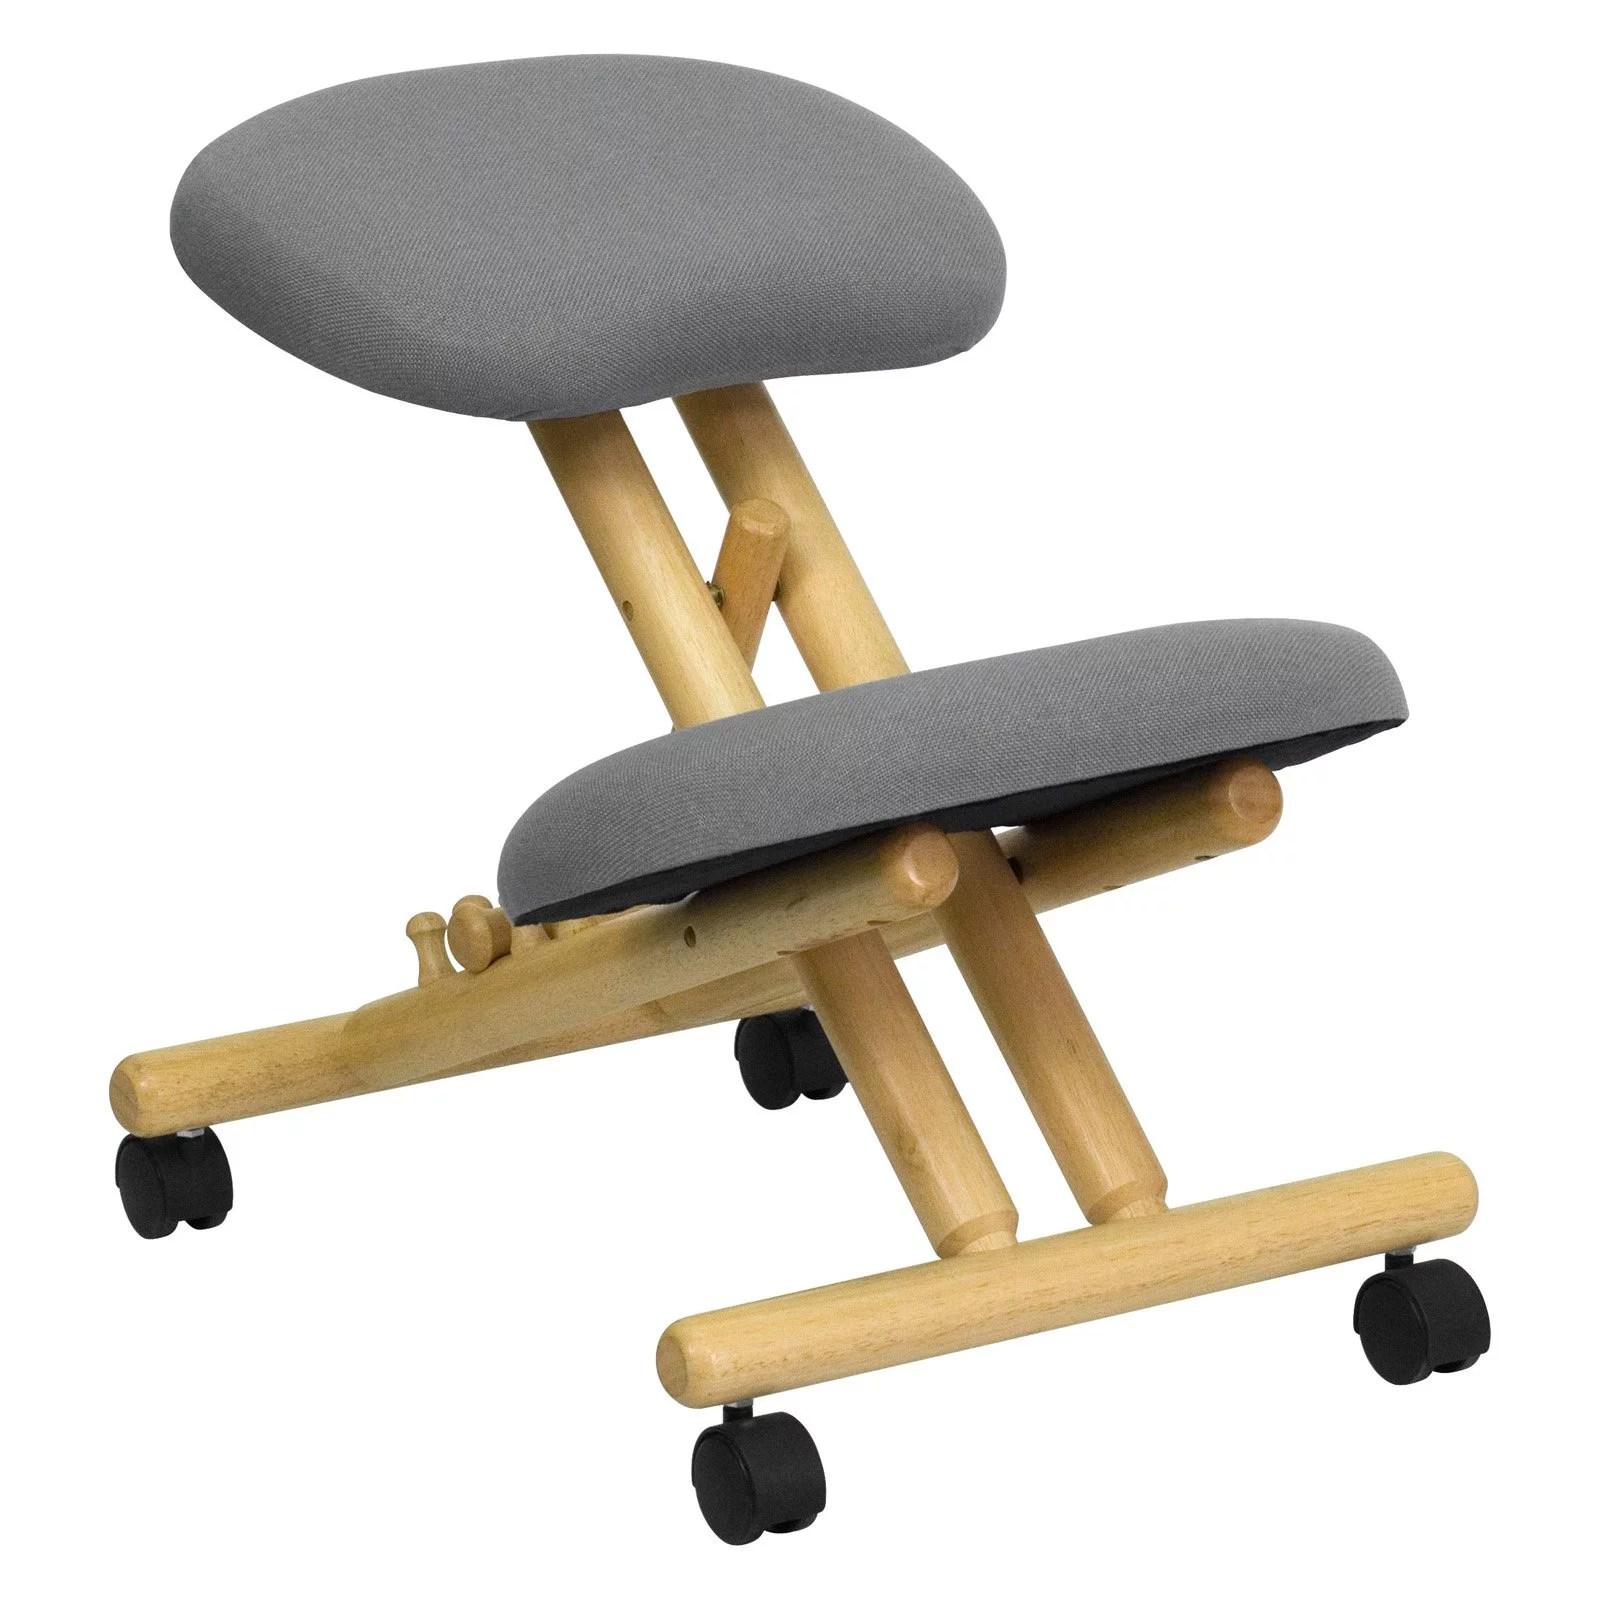 ergonomic chair kneeling posture custom patio cushions wooden office grey walmart com